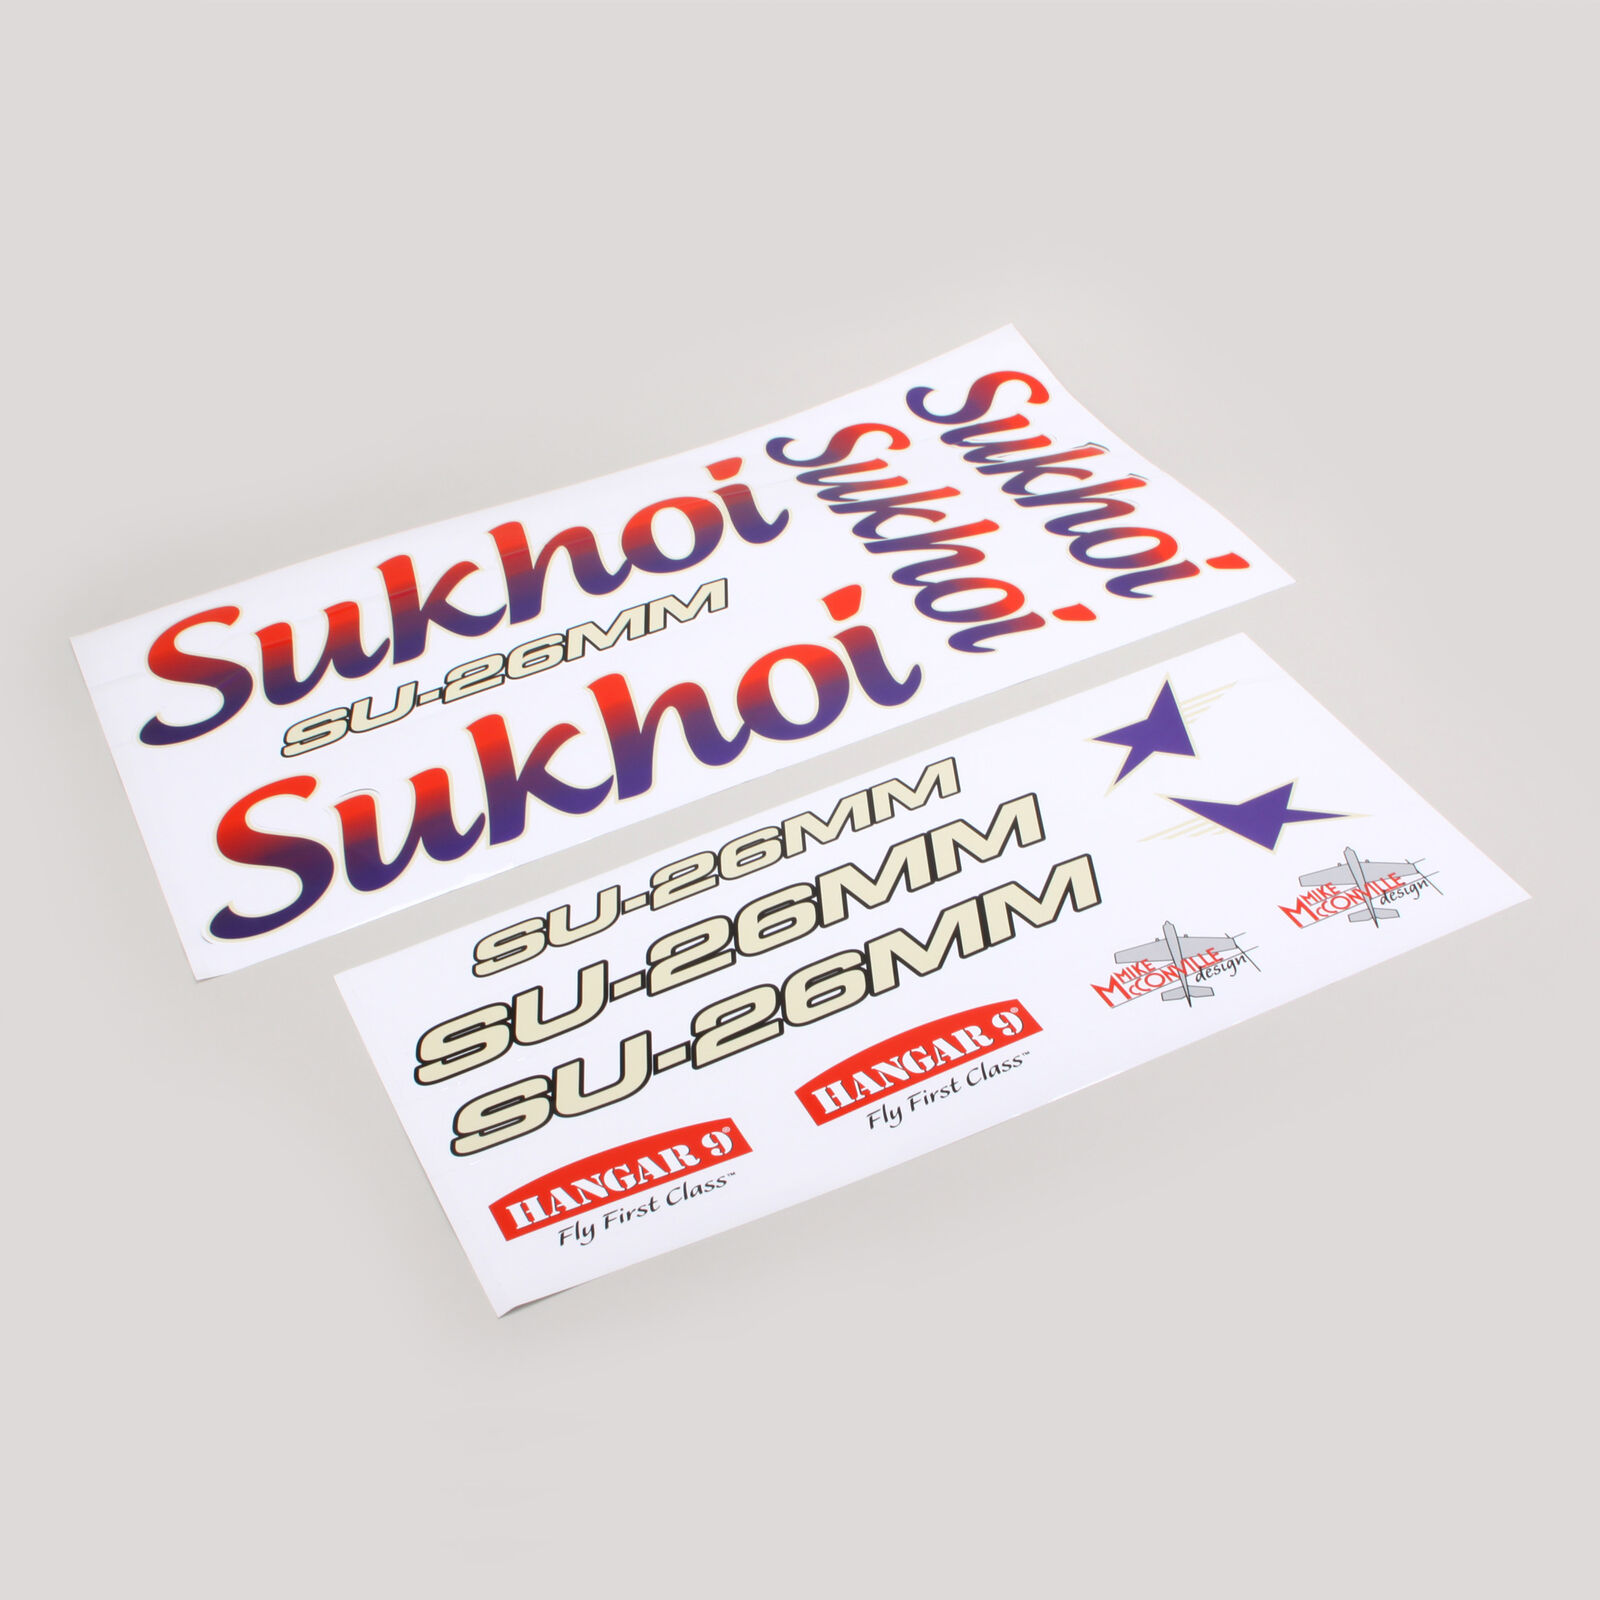 Decal Sheet: 3.1m Sukhoi SU-26MM